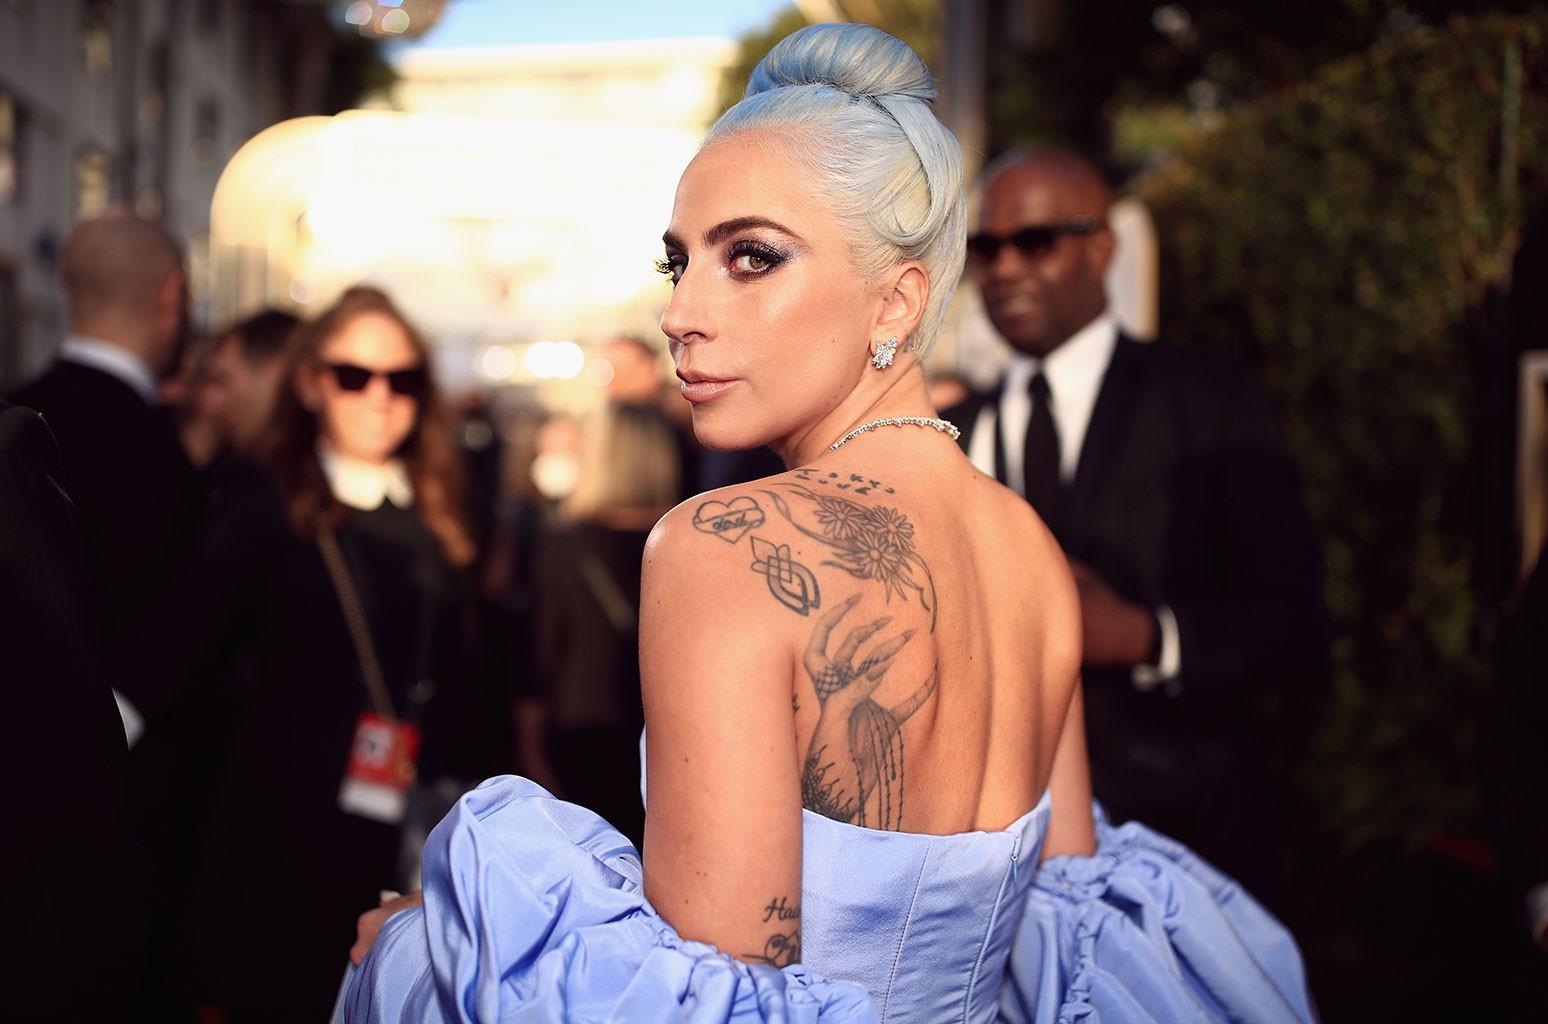 Kisah Perjalanan Hidup Lady Gaga